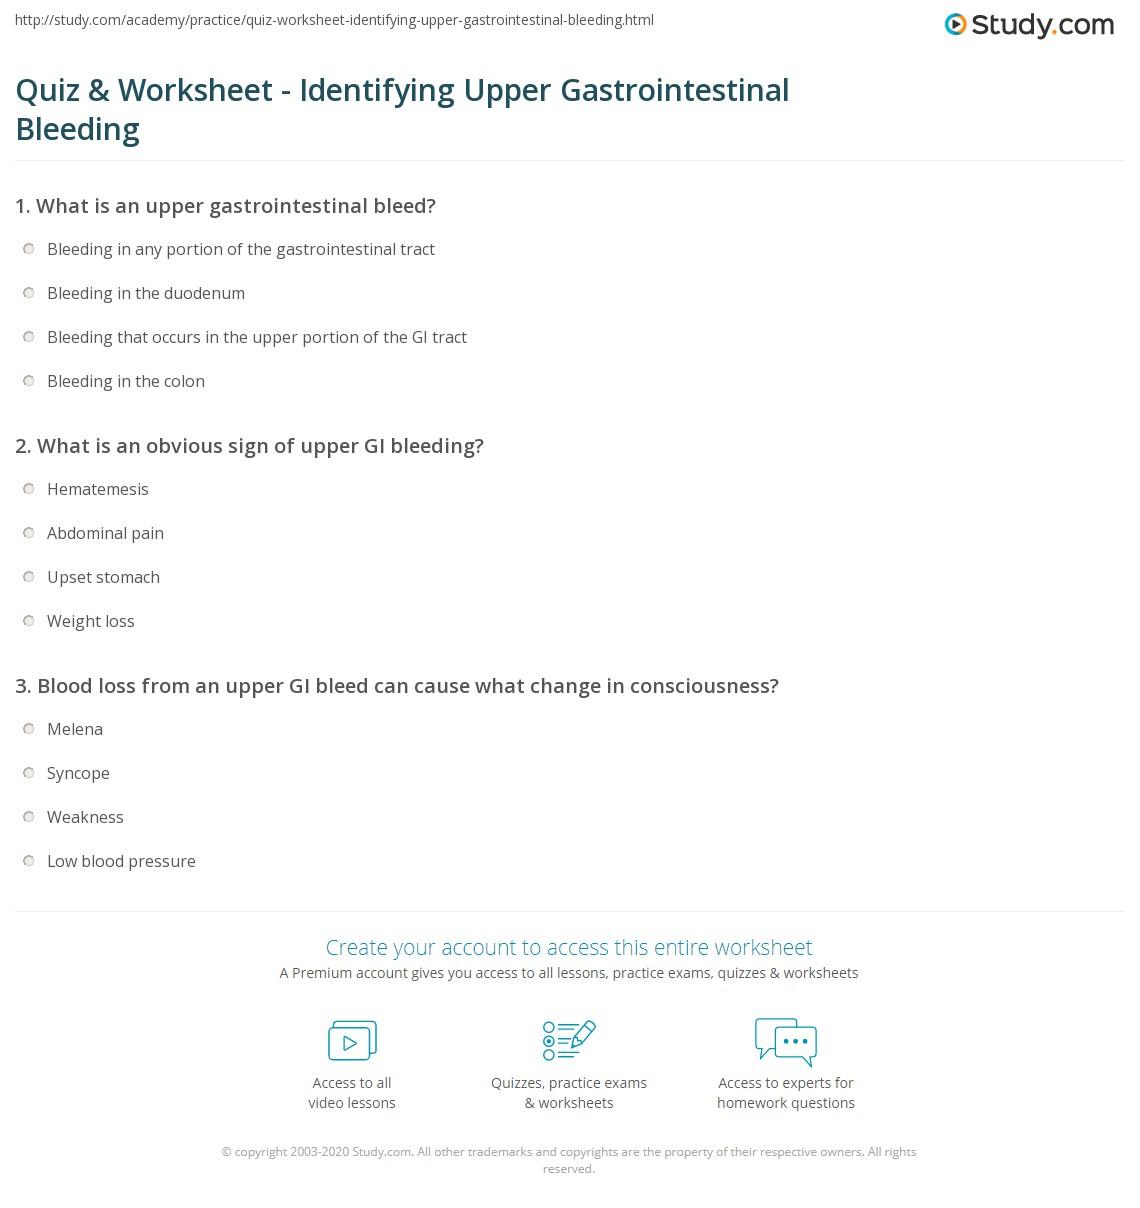 Quiz & Worksheet - Identifying Upper Gastrointestinal Bleeding